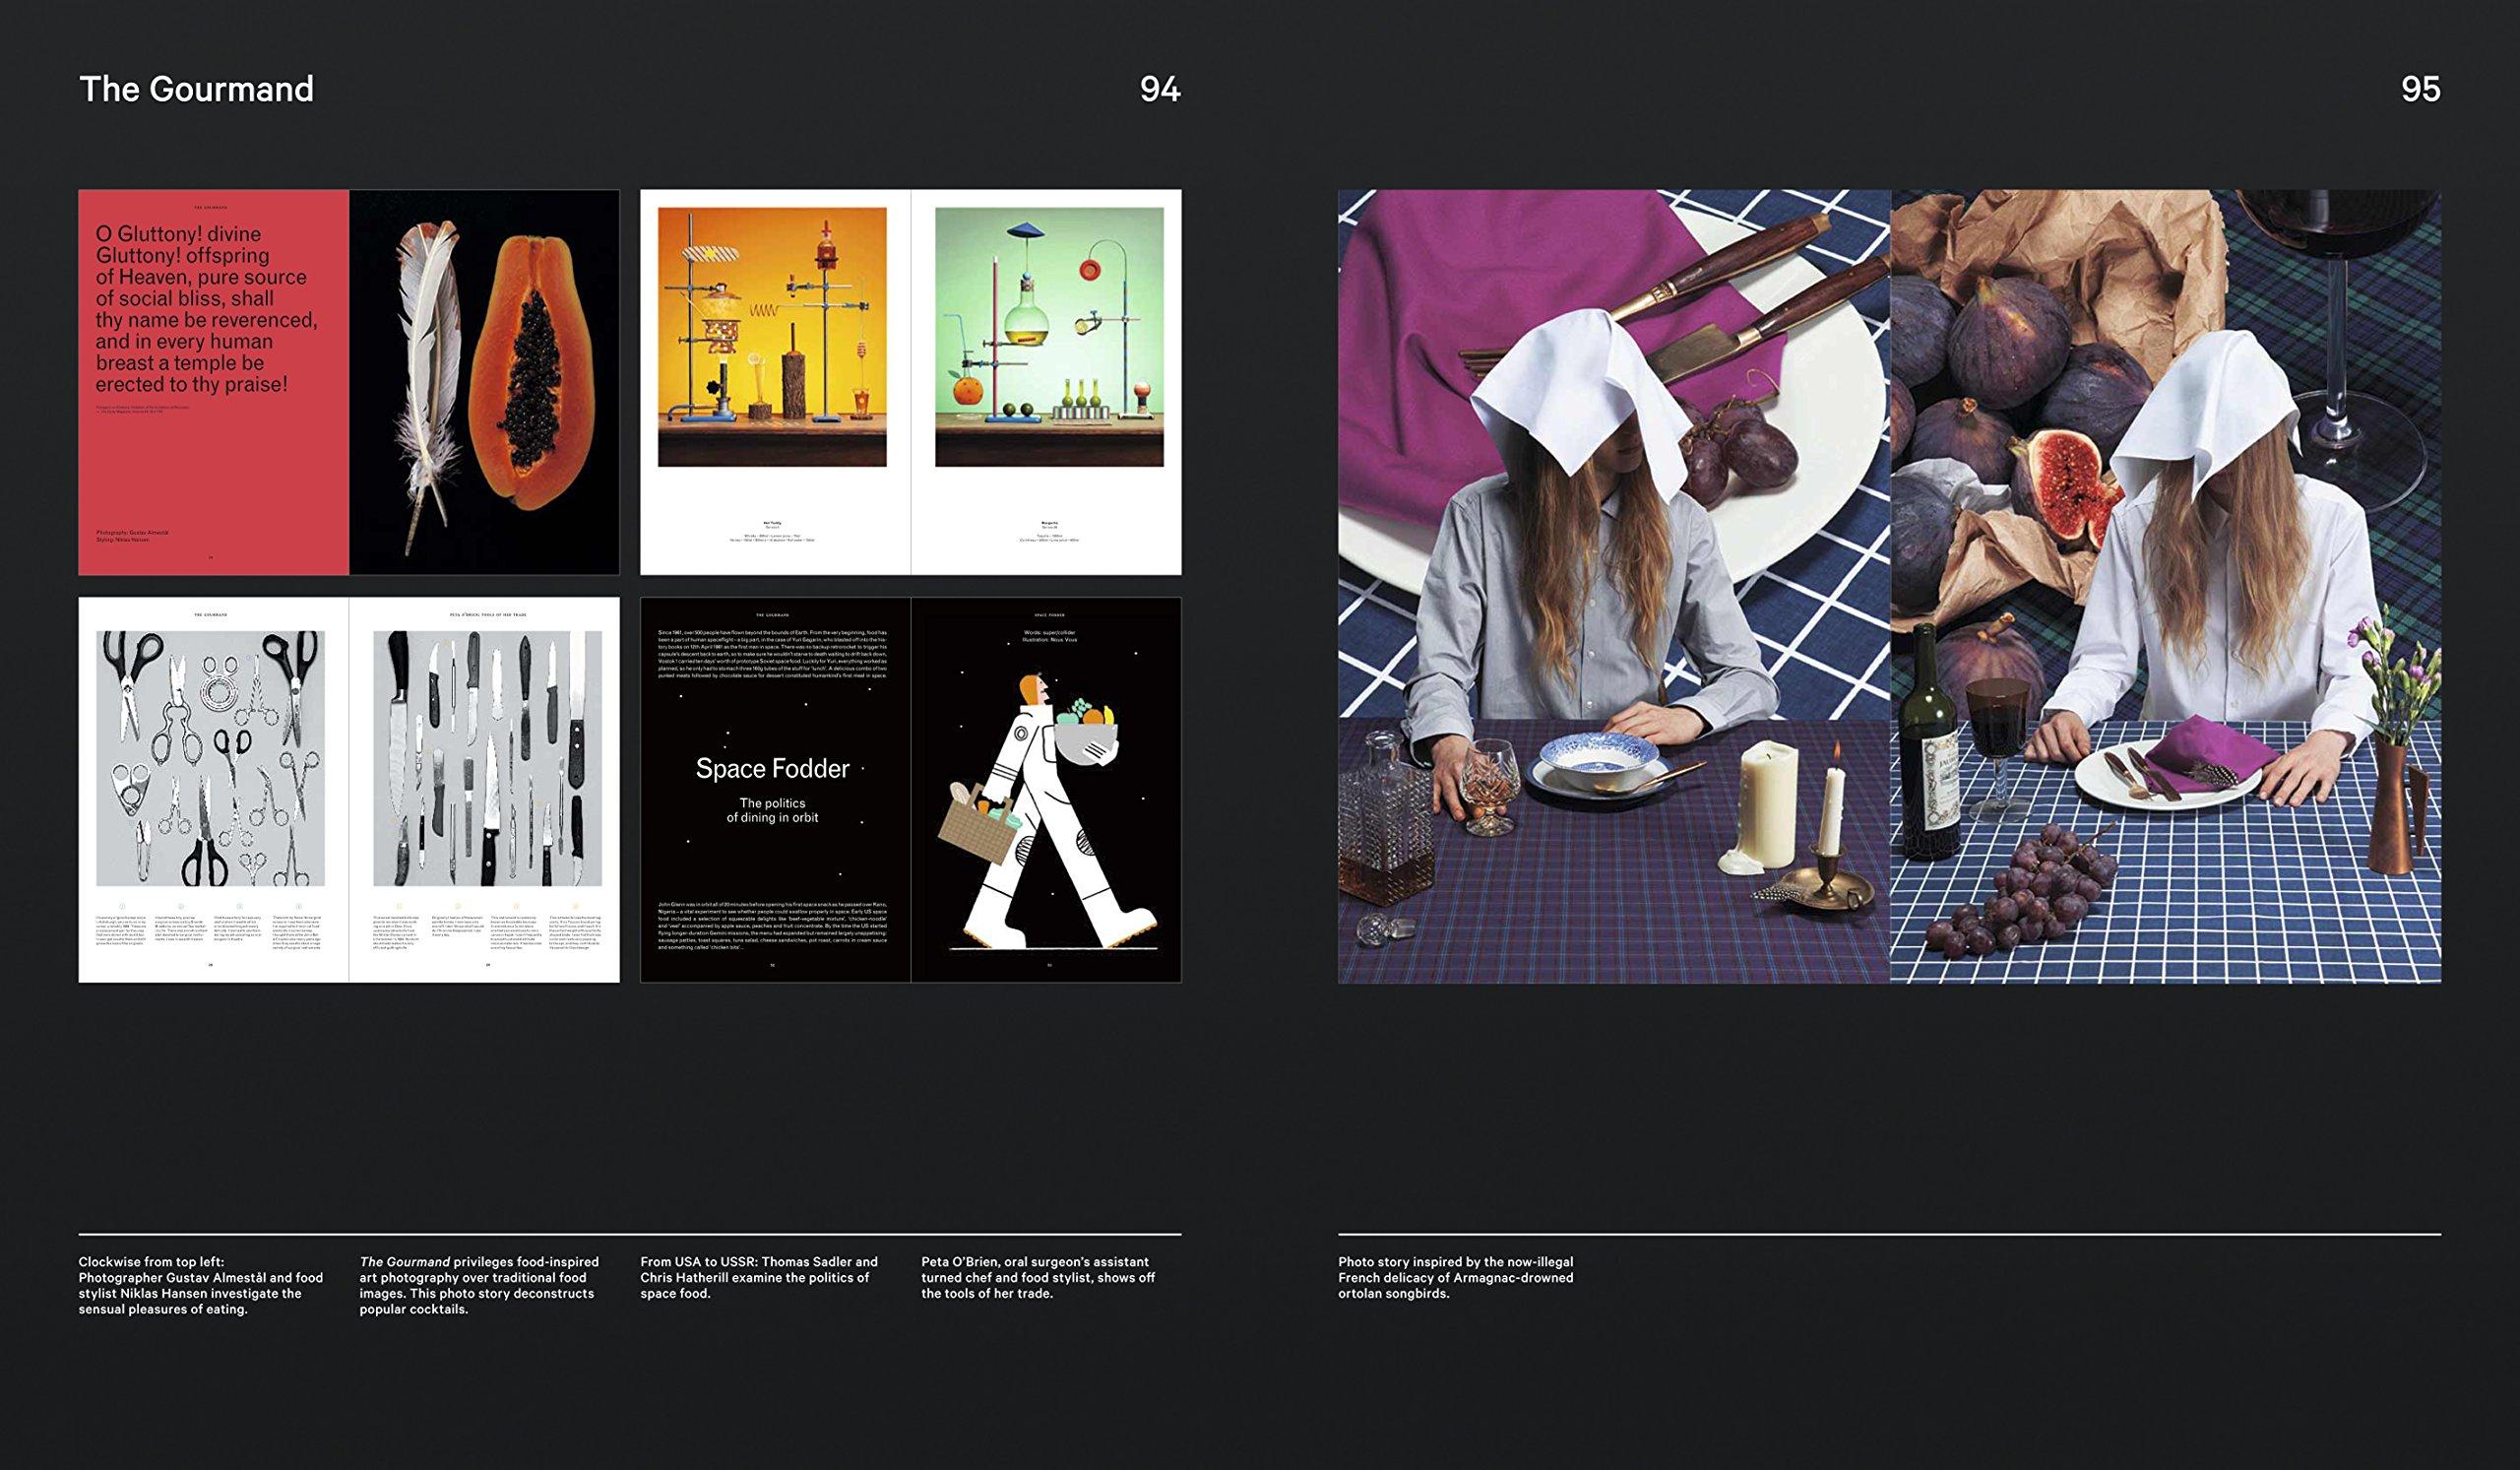 print-is-dead-long-live-print-book4